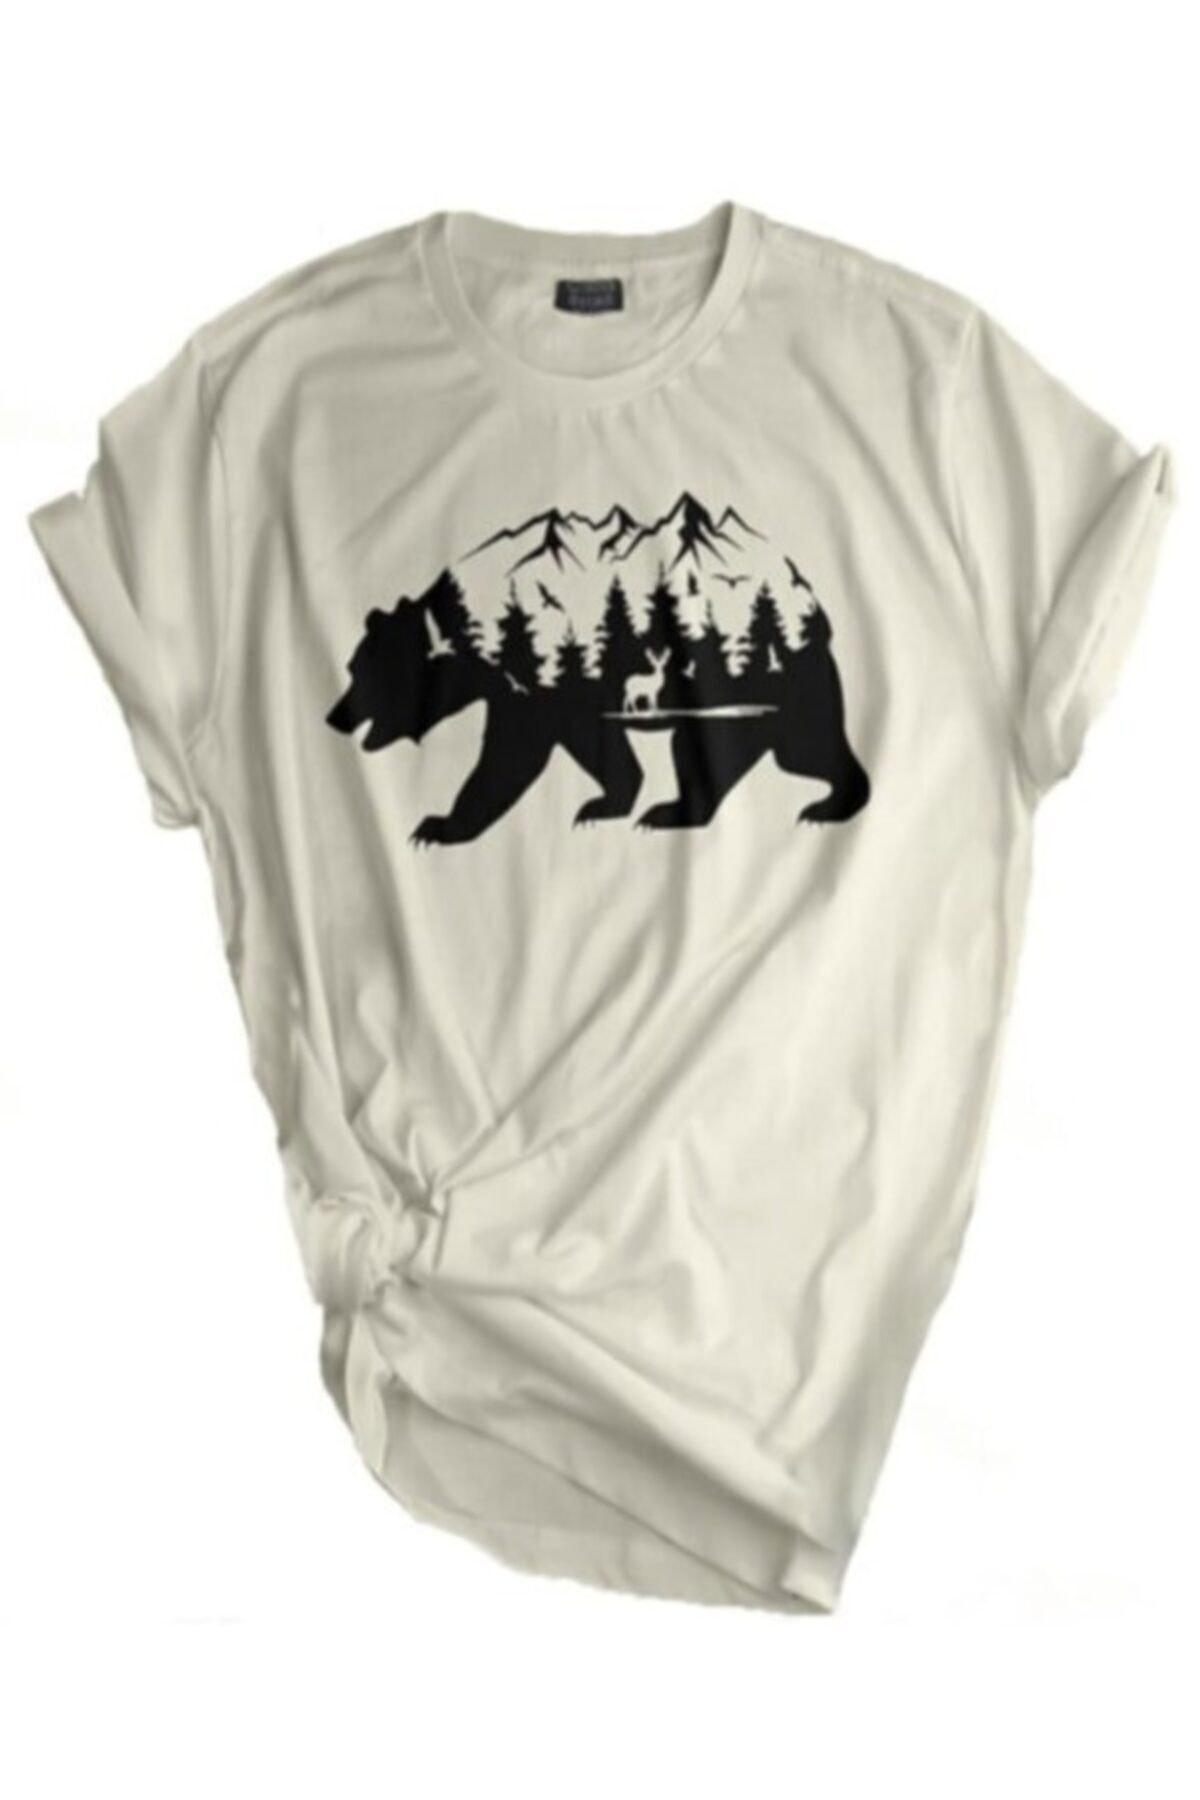 Store Unisex Tişört Outdoor Baskılı T-shirt